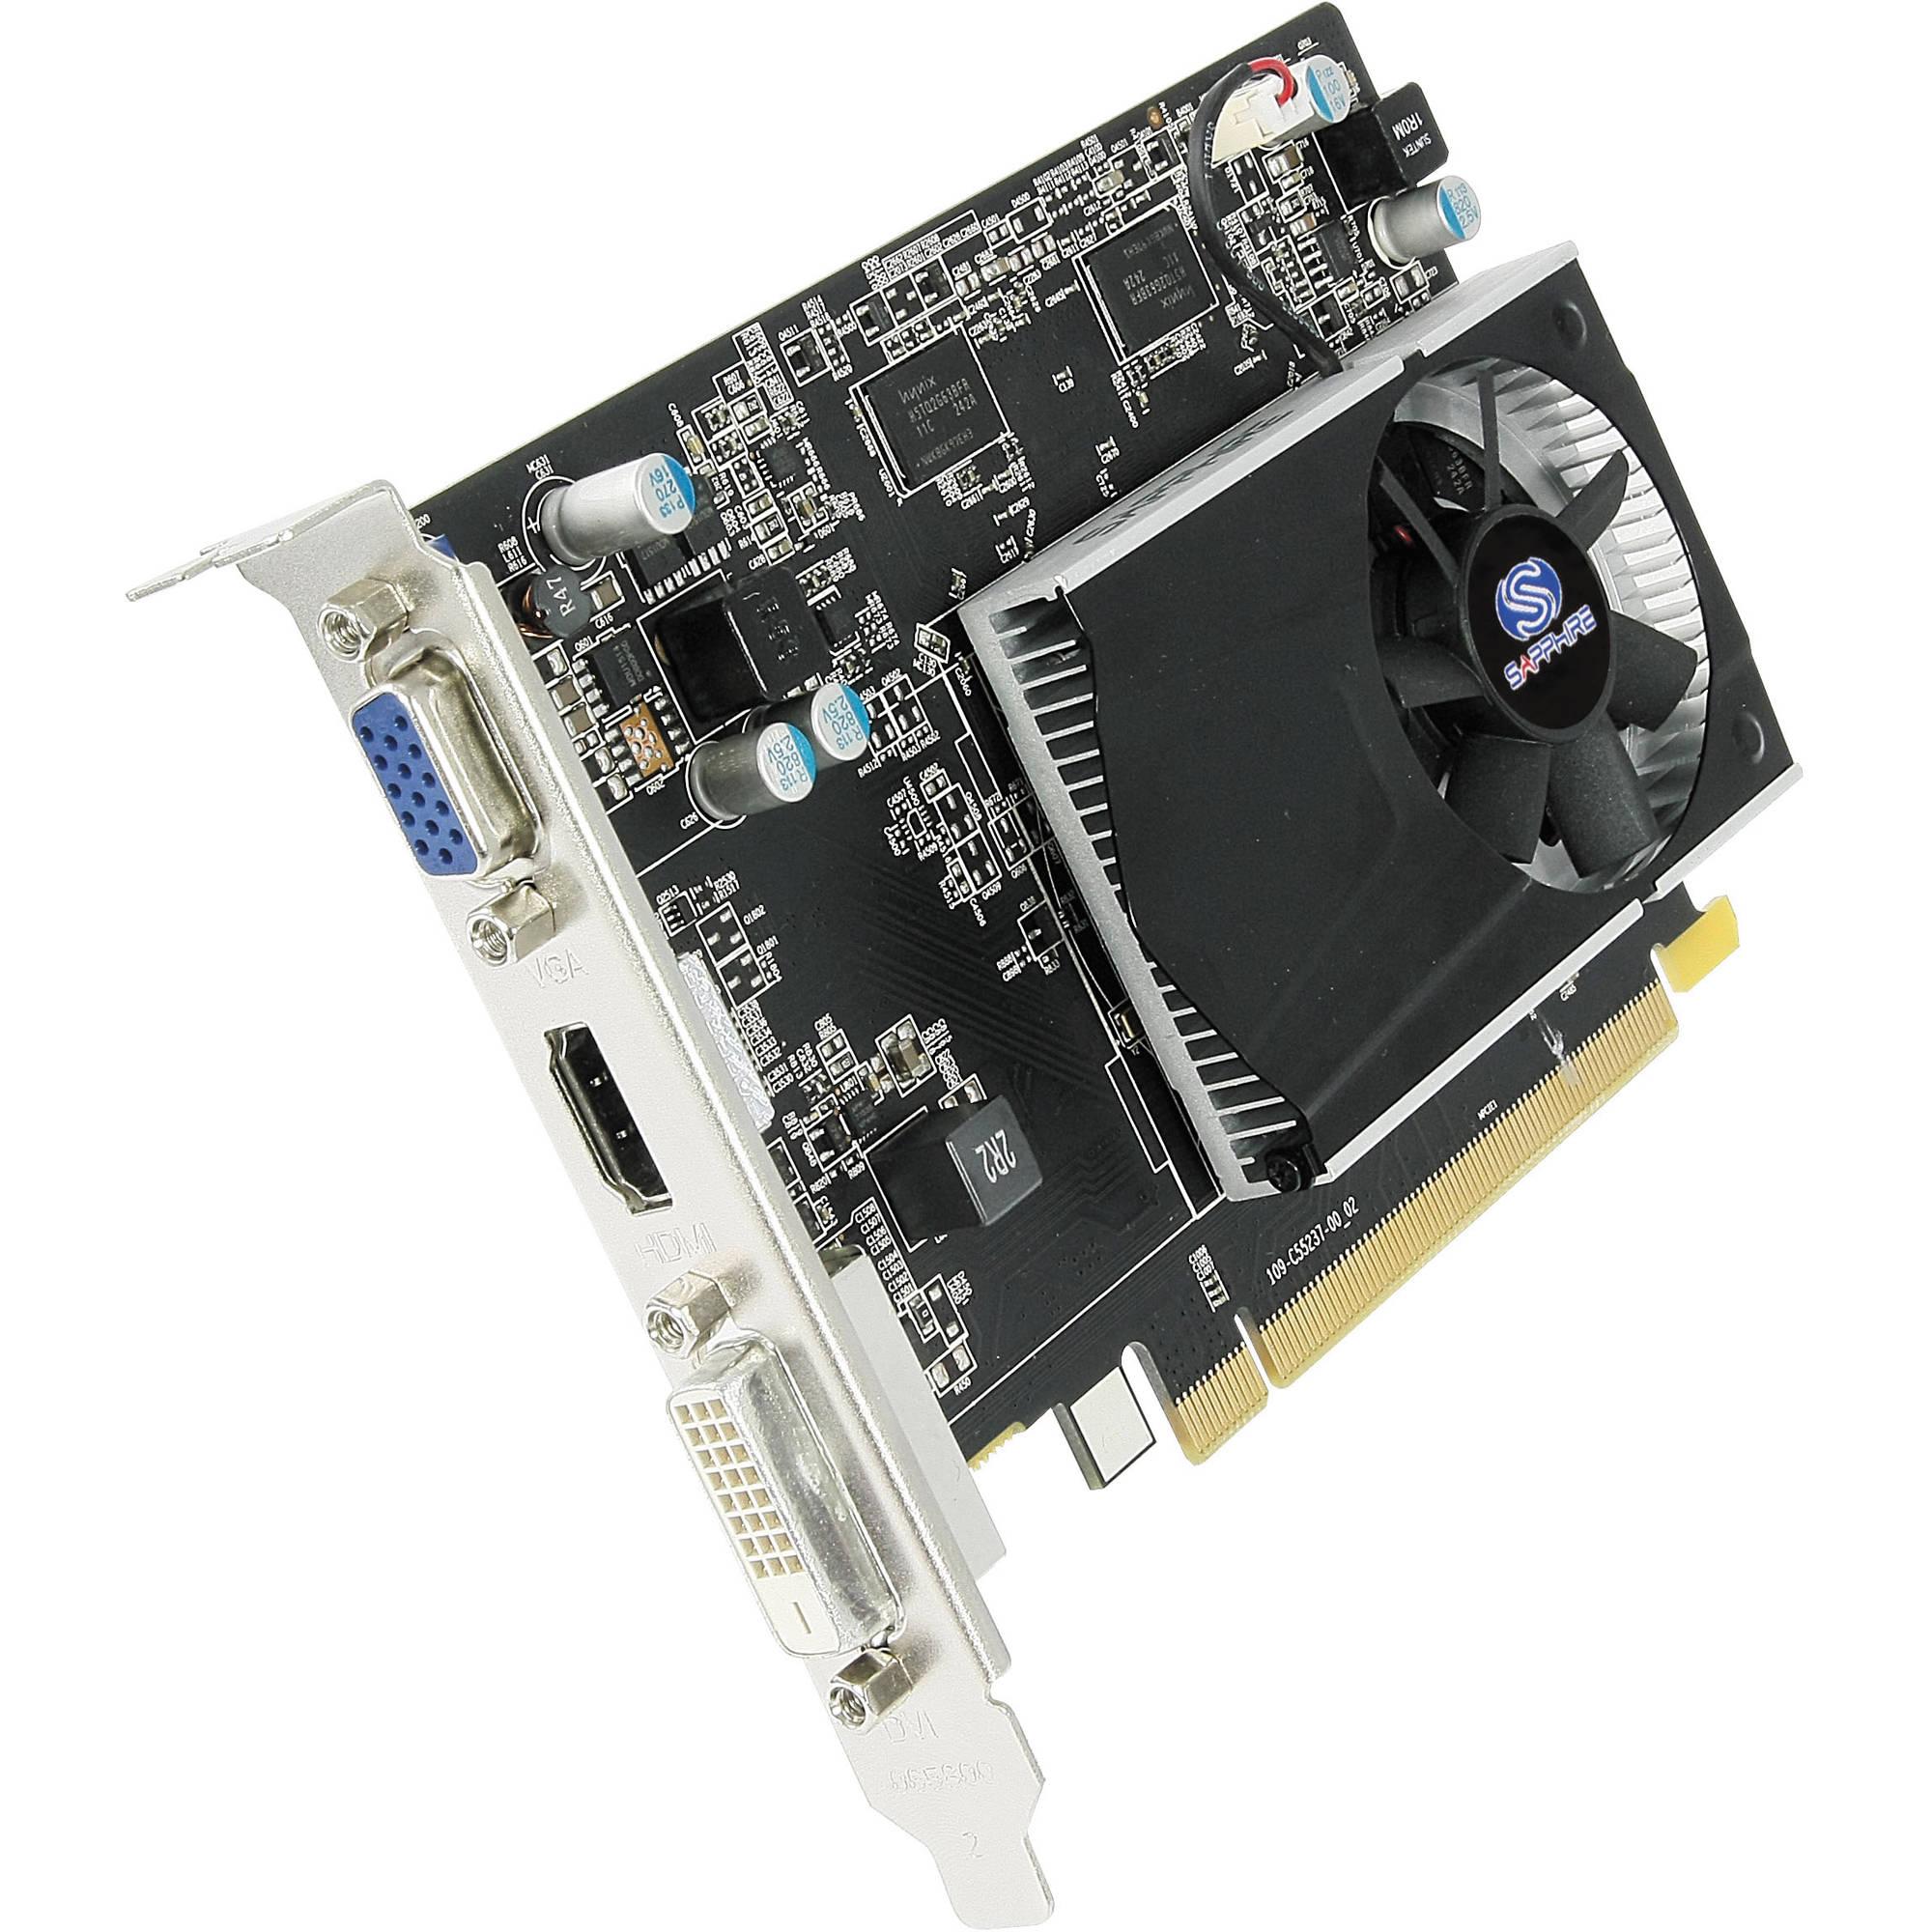 Sapphire Radeon R7 240 Graphics Card (2GB DDR3Boost)